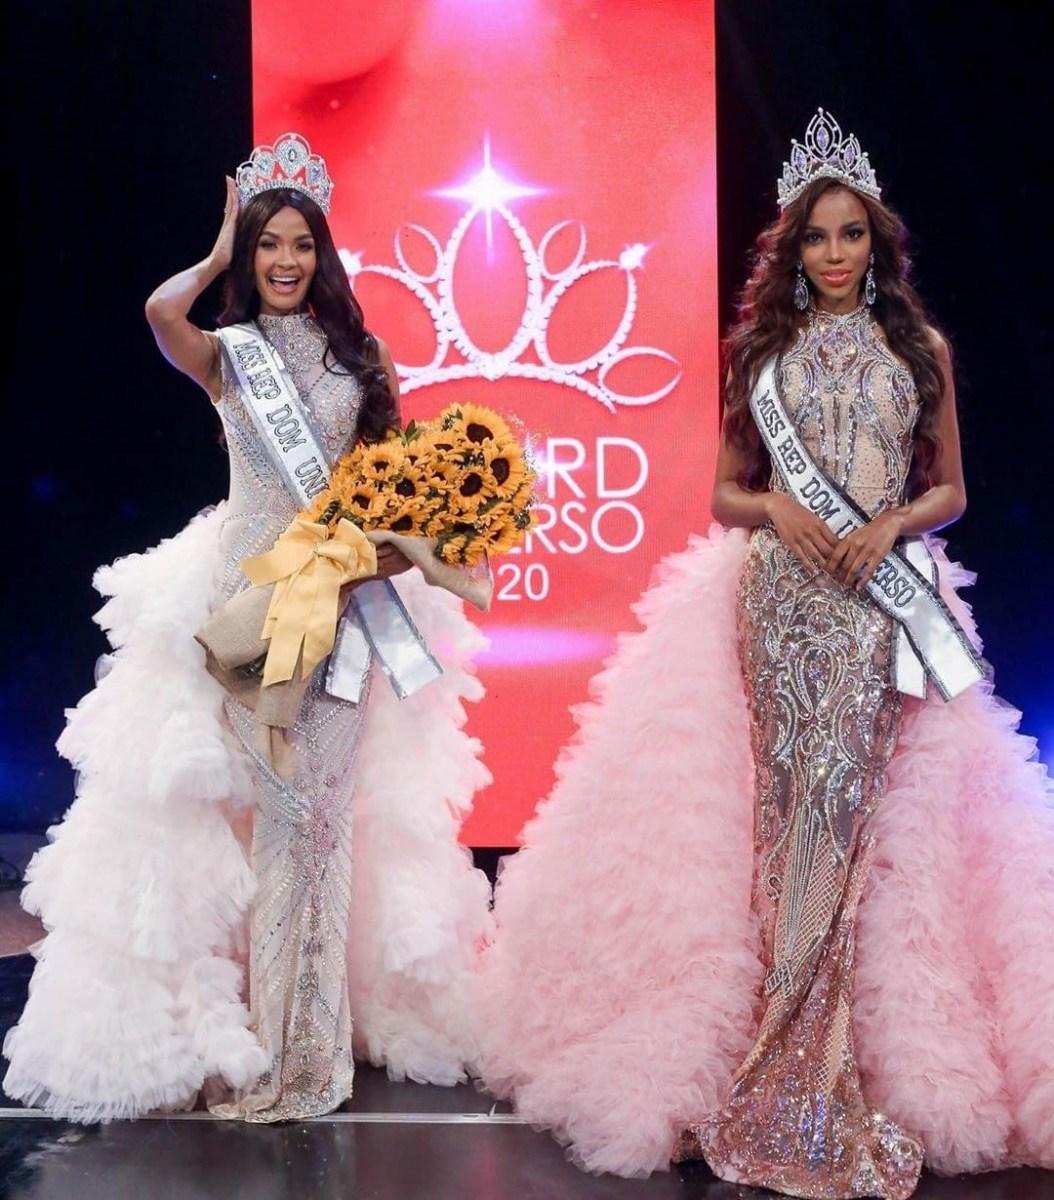 kimberly jimenez, miss universe dominican republic 2020. A8fxkf7u